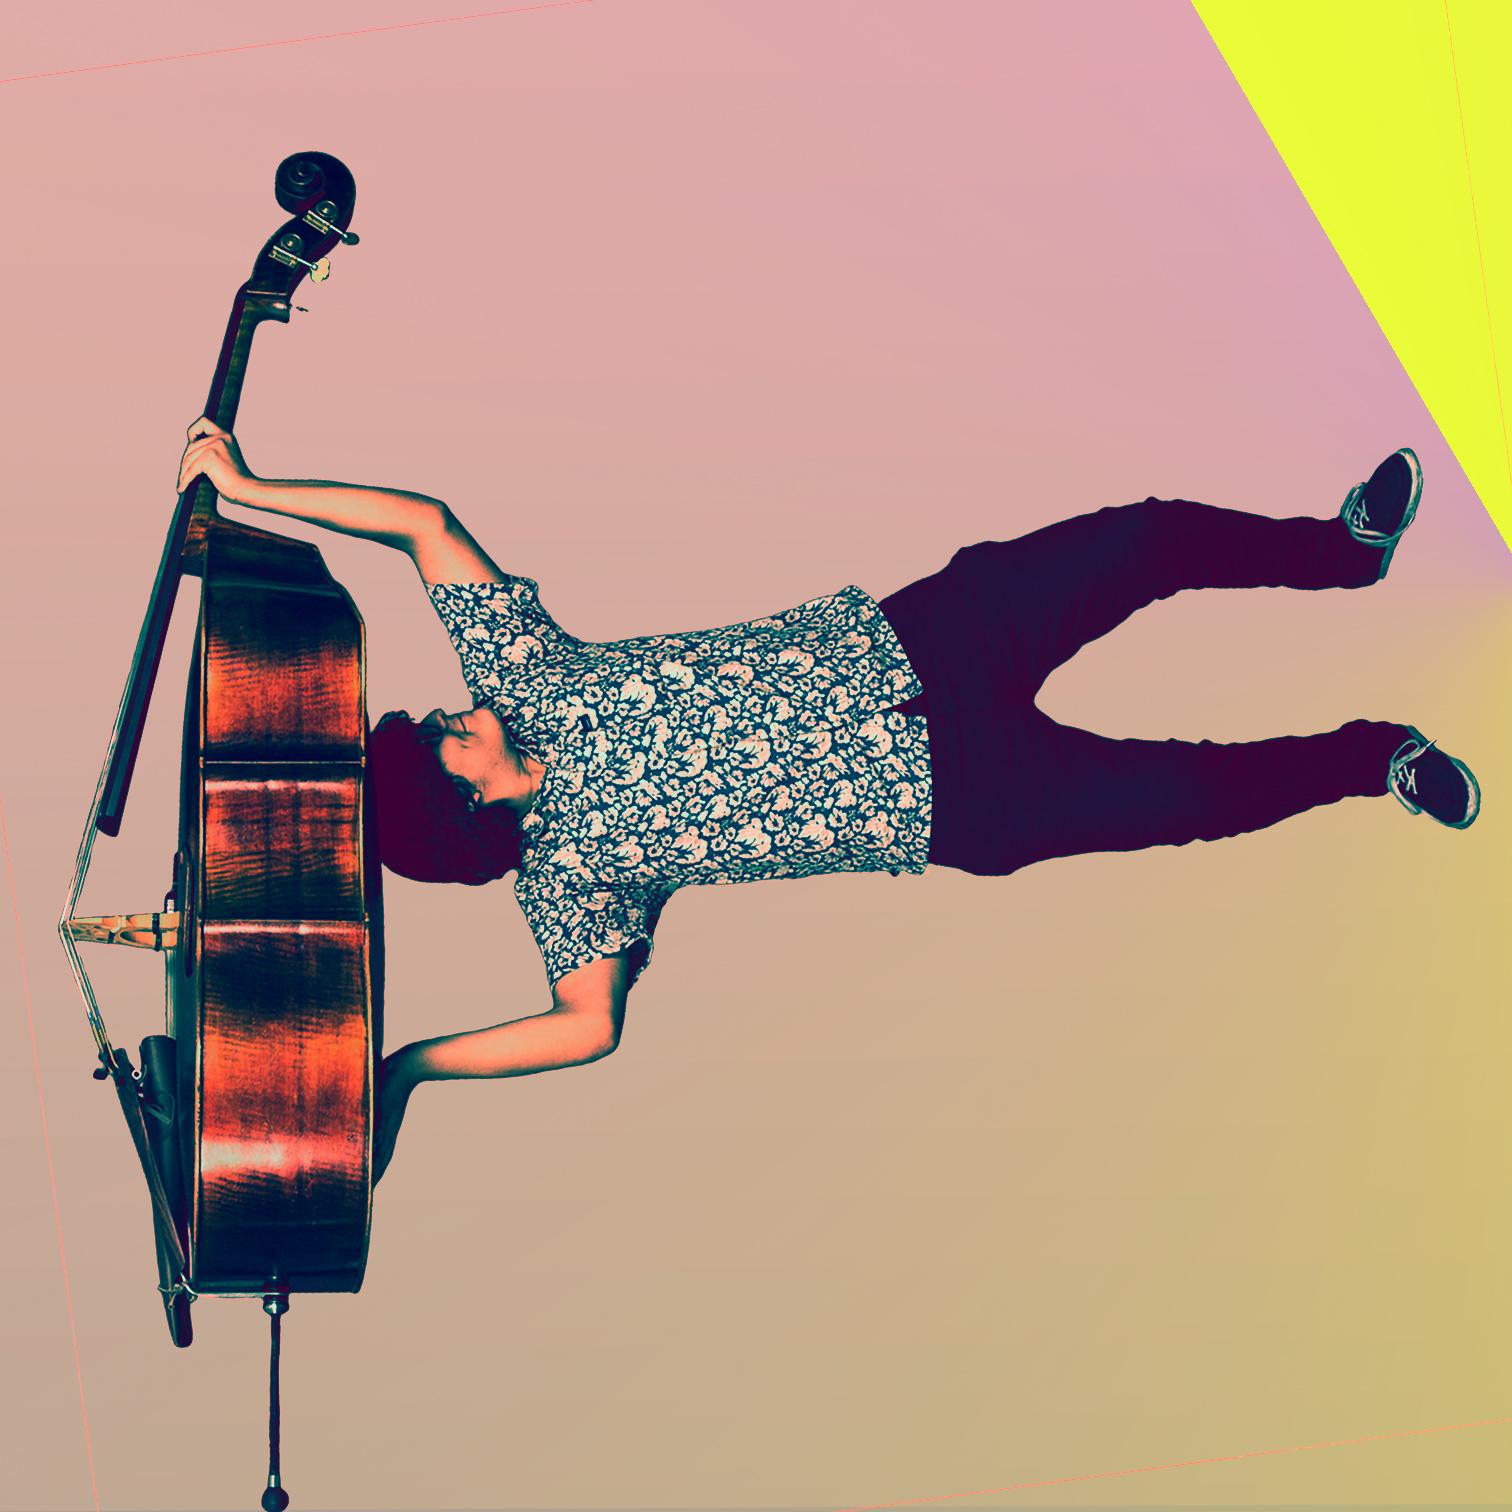 Nic Dominguez - musician